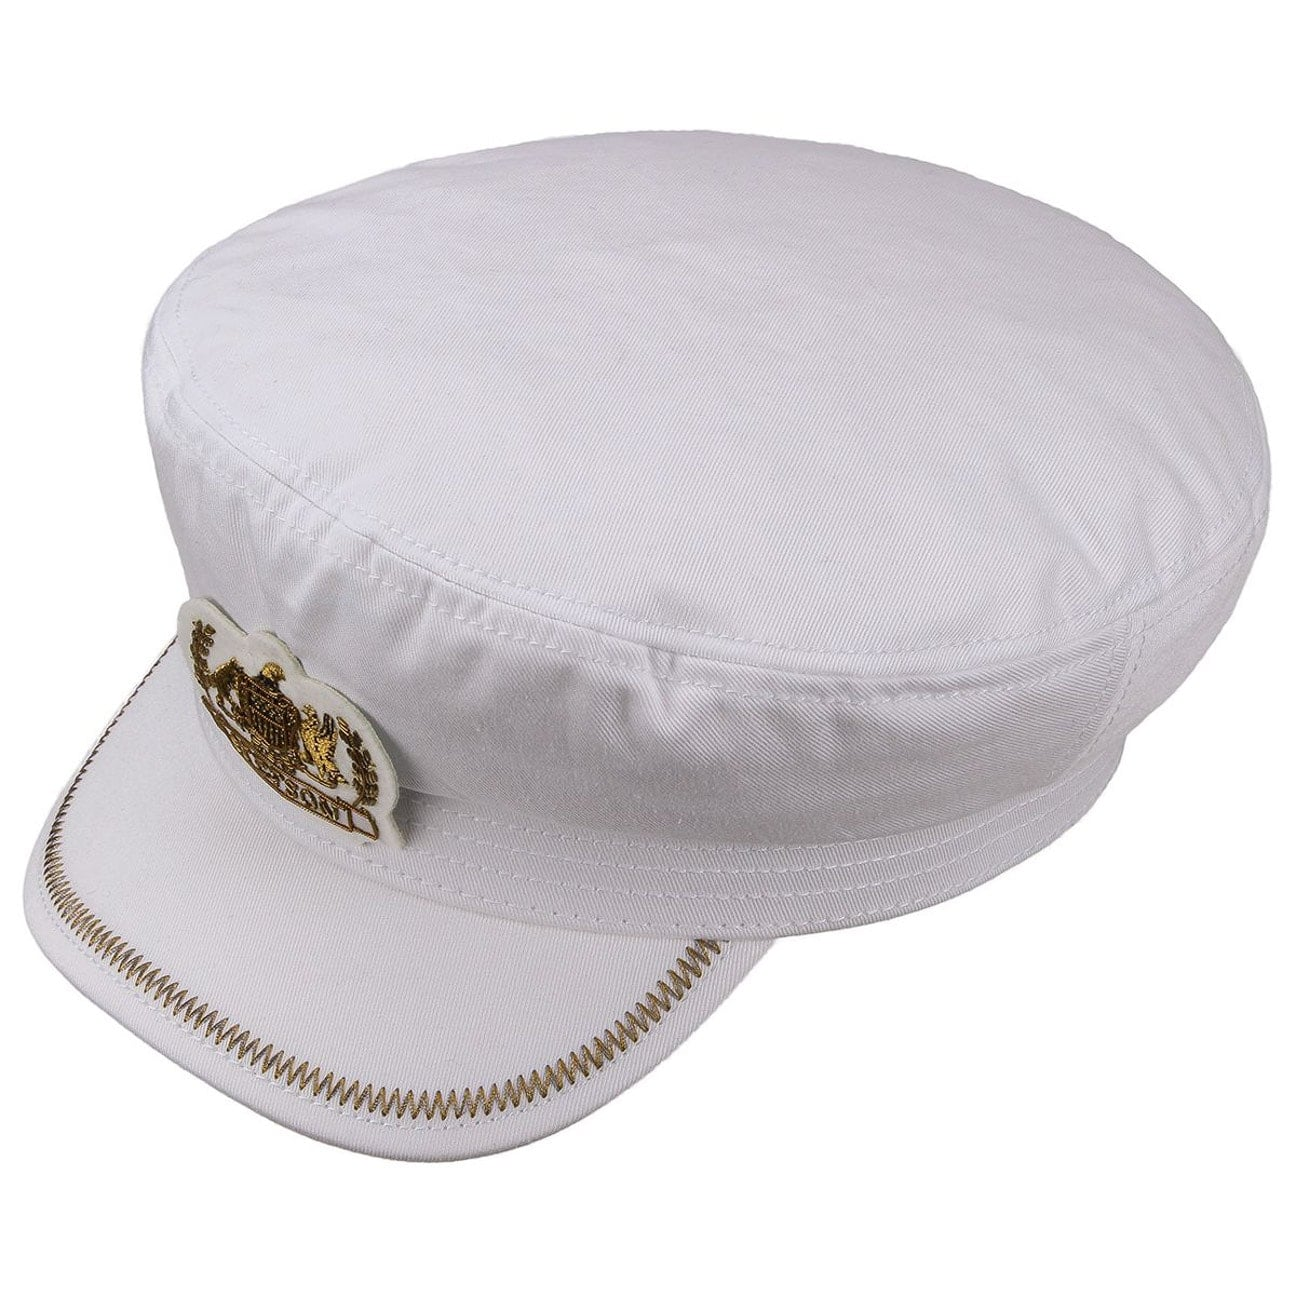 Fishermans Hat: Allenport Fisherman's Hat By Stetson, EUR 59,00 --> Hats